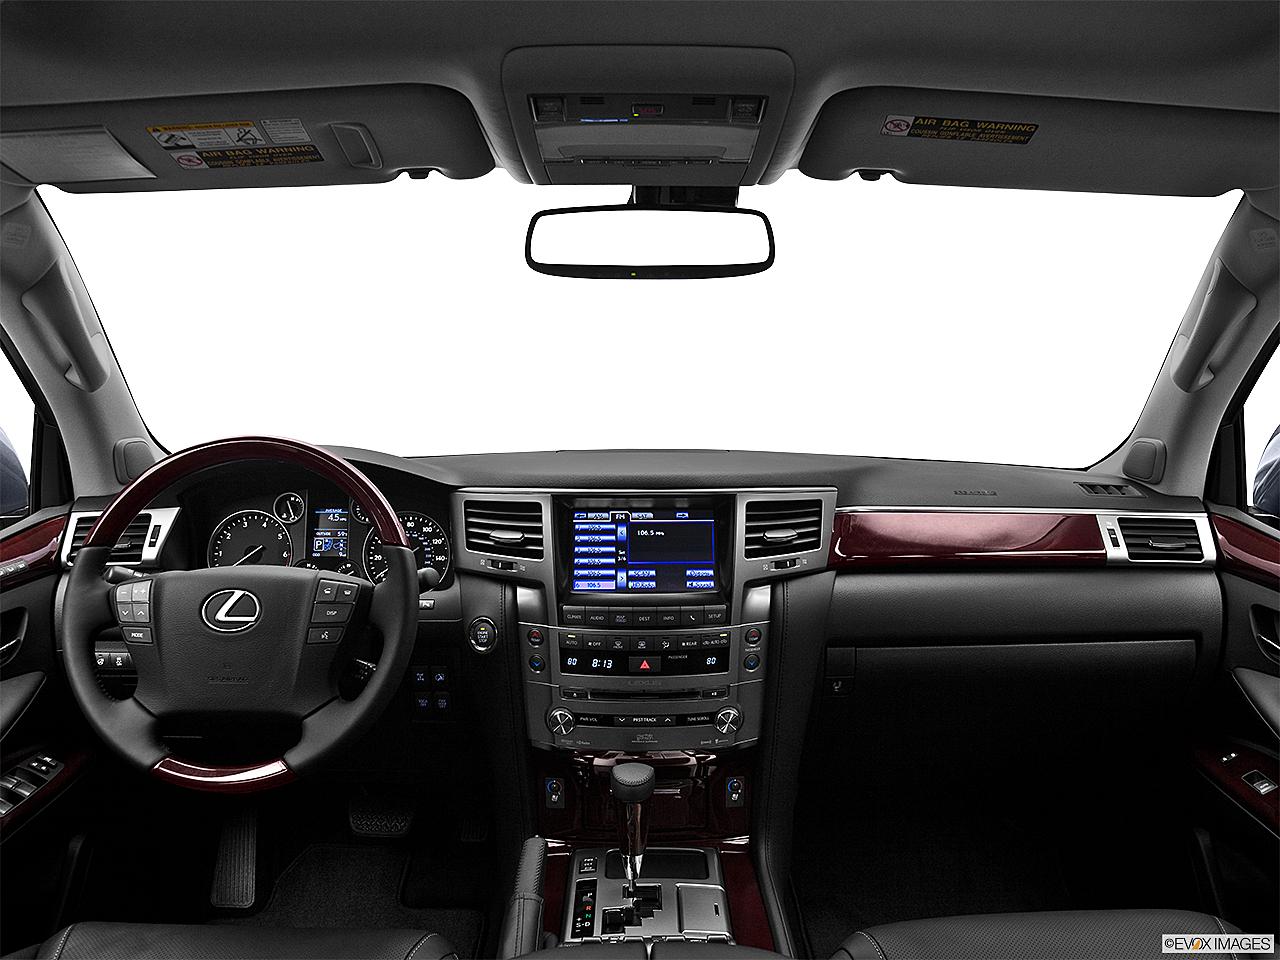 Lexus 2013 lexus lx : 2013 Lexus LX 570 AWD 4dr SUV - Research - GrooveCar